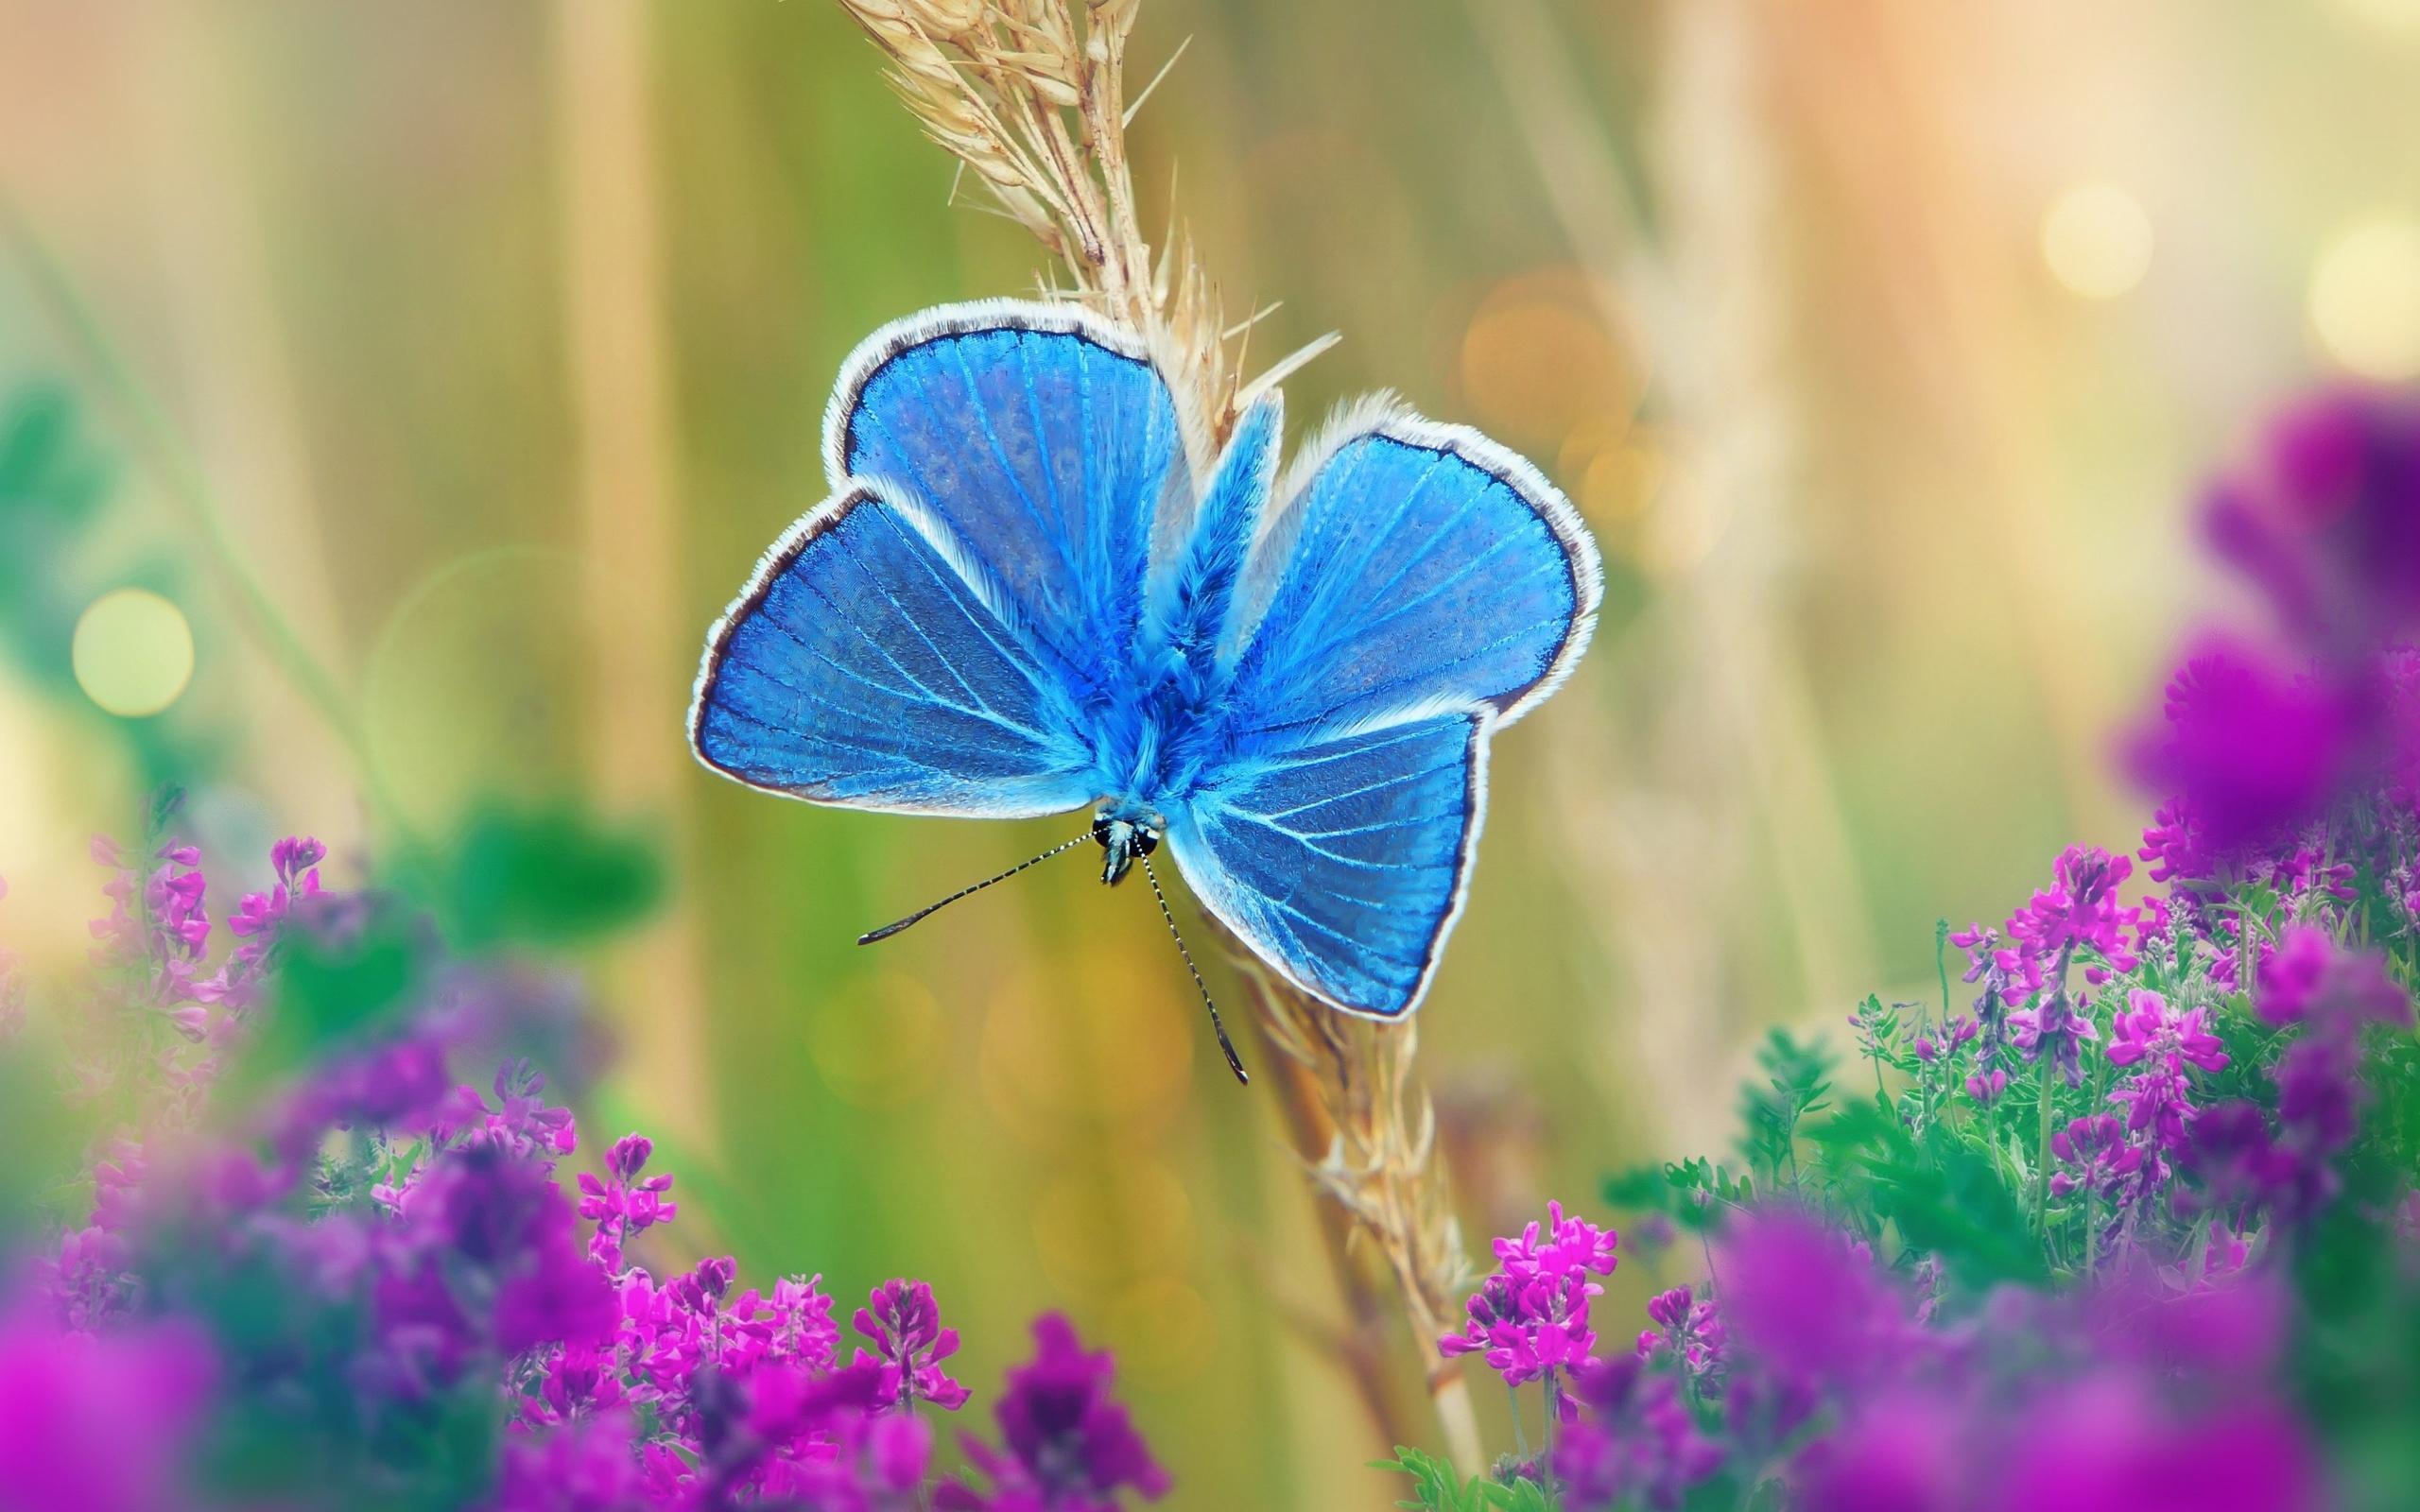 голубая, бабочка, цветы